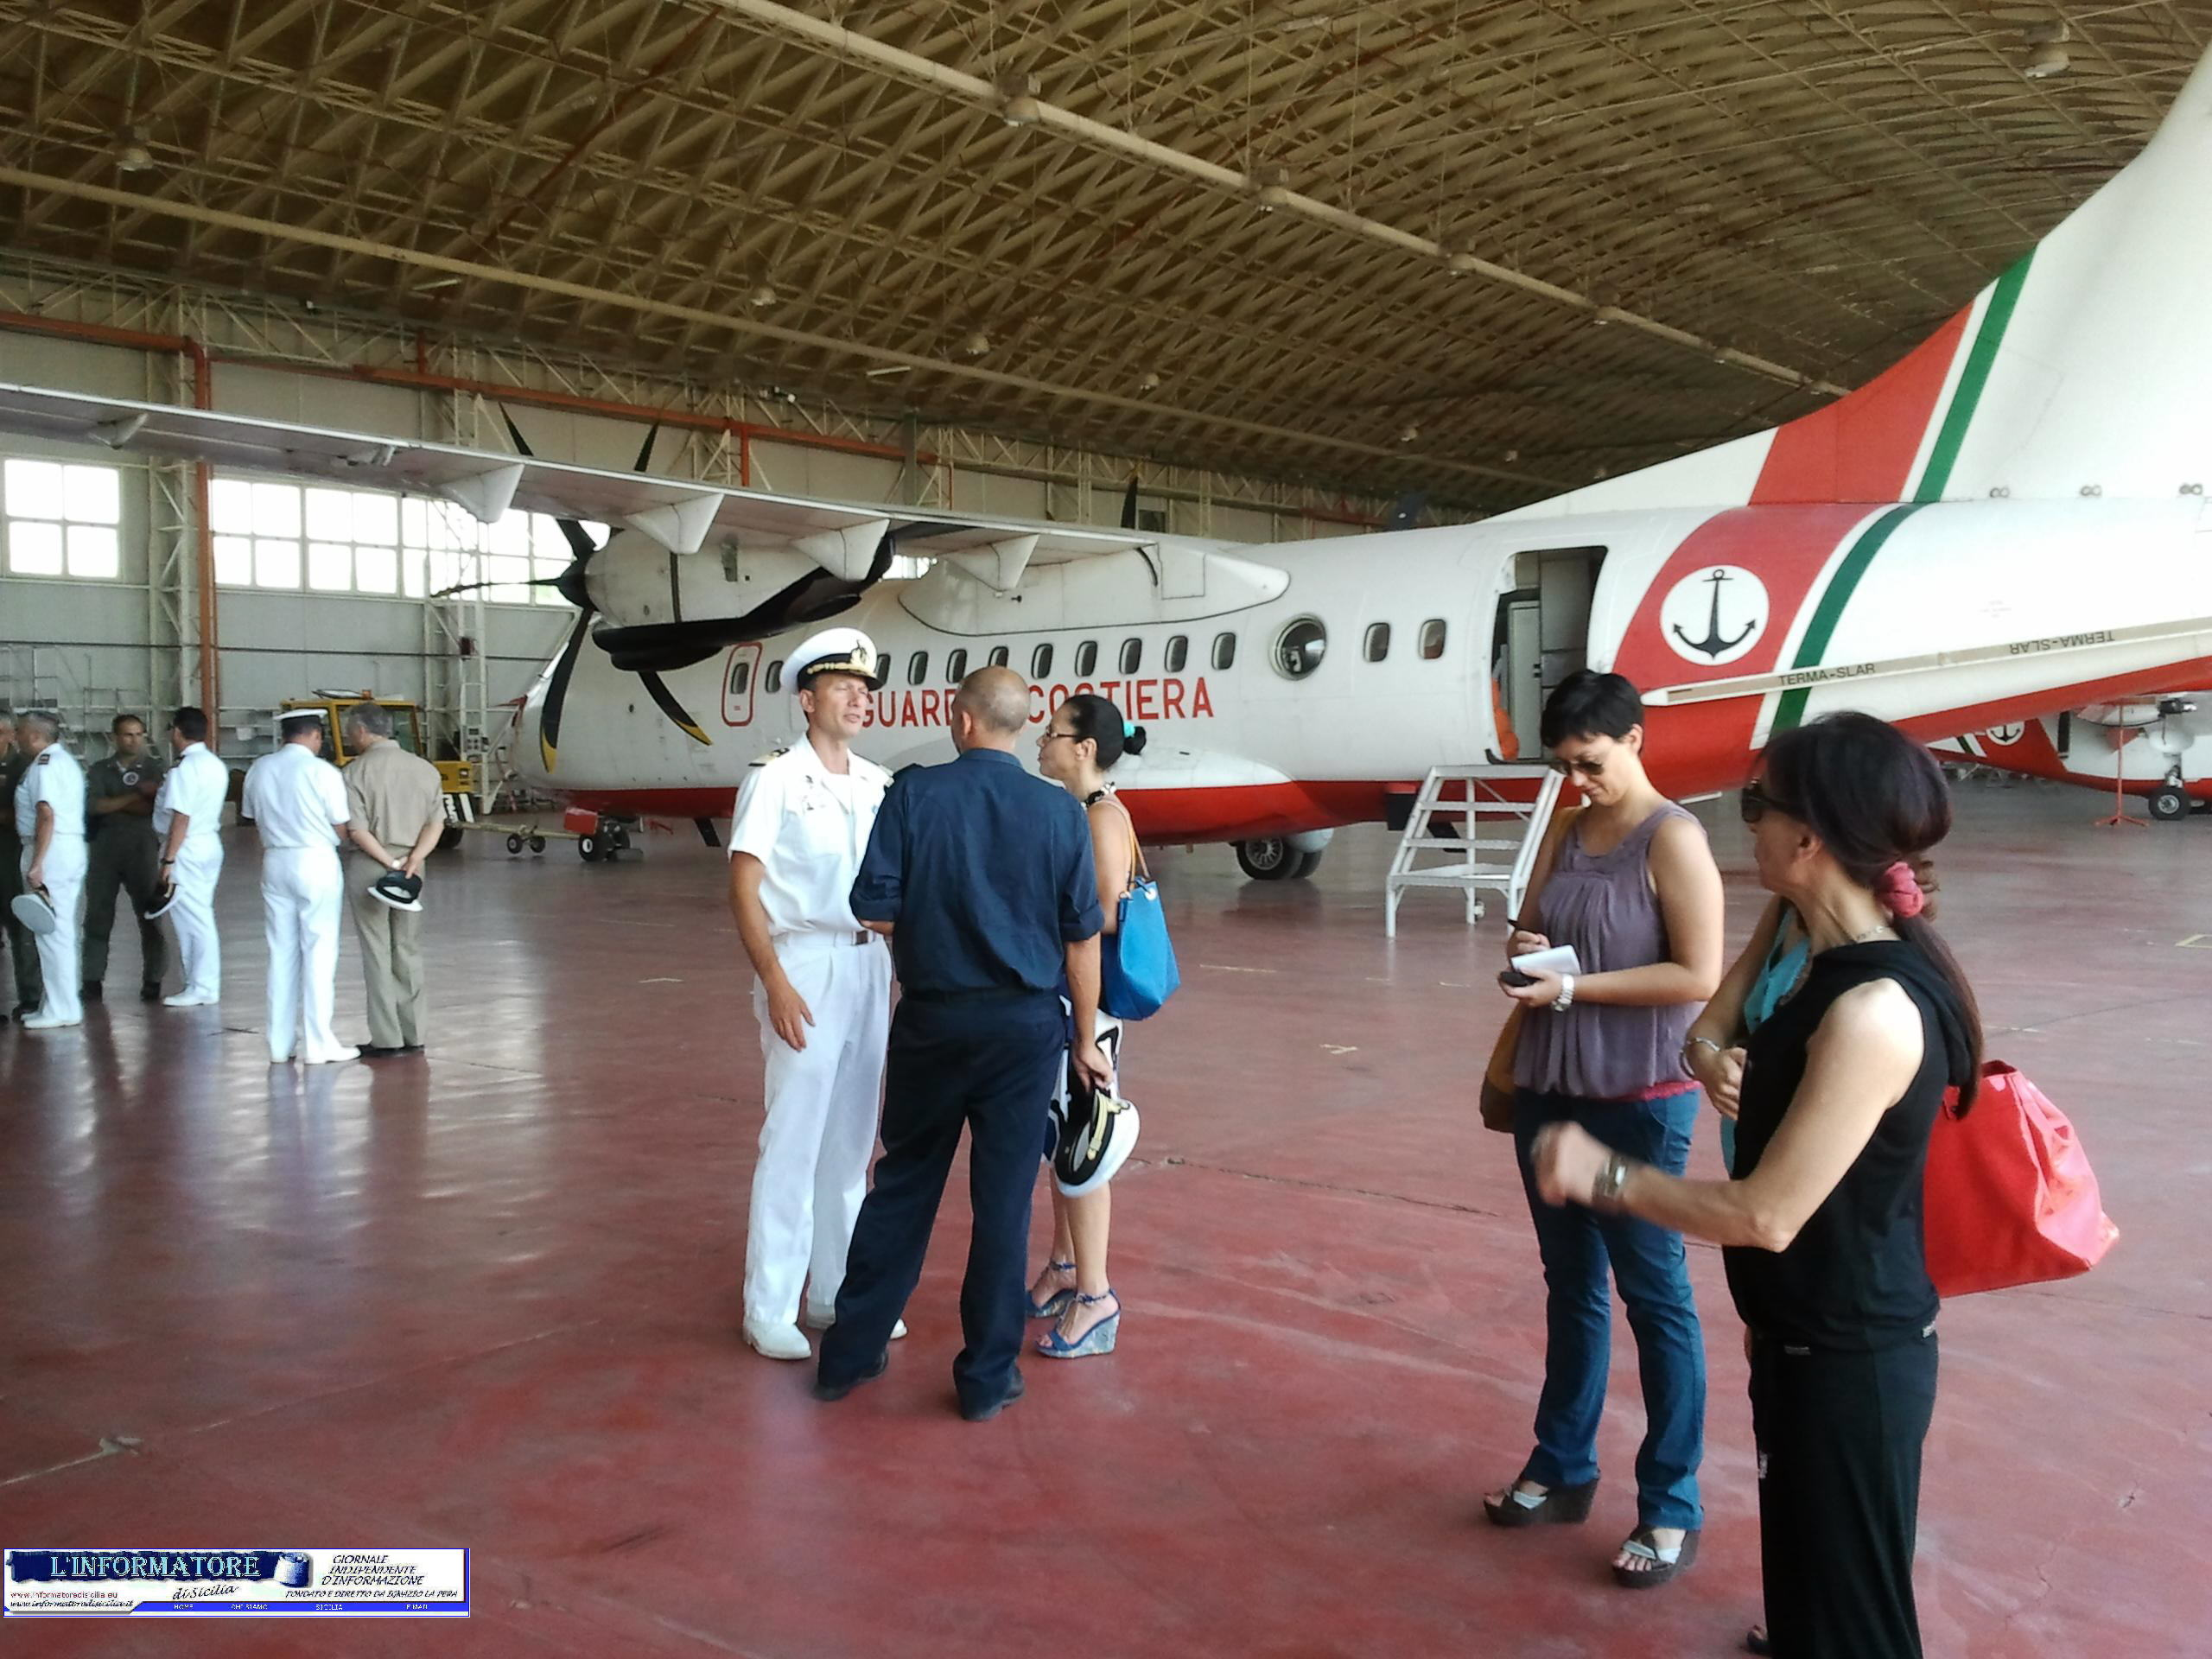 incontri pearson departures Taranto